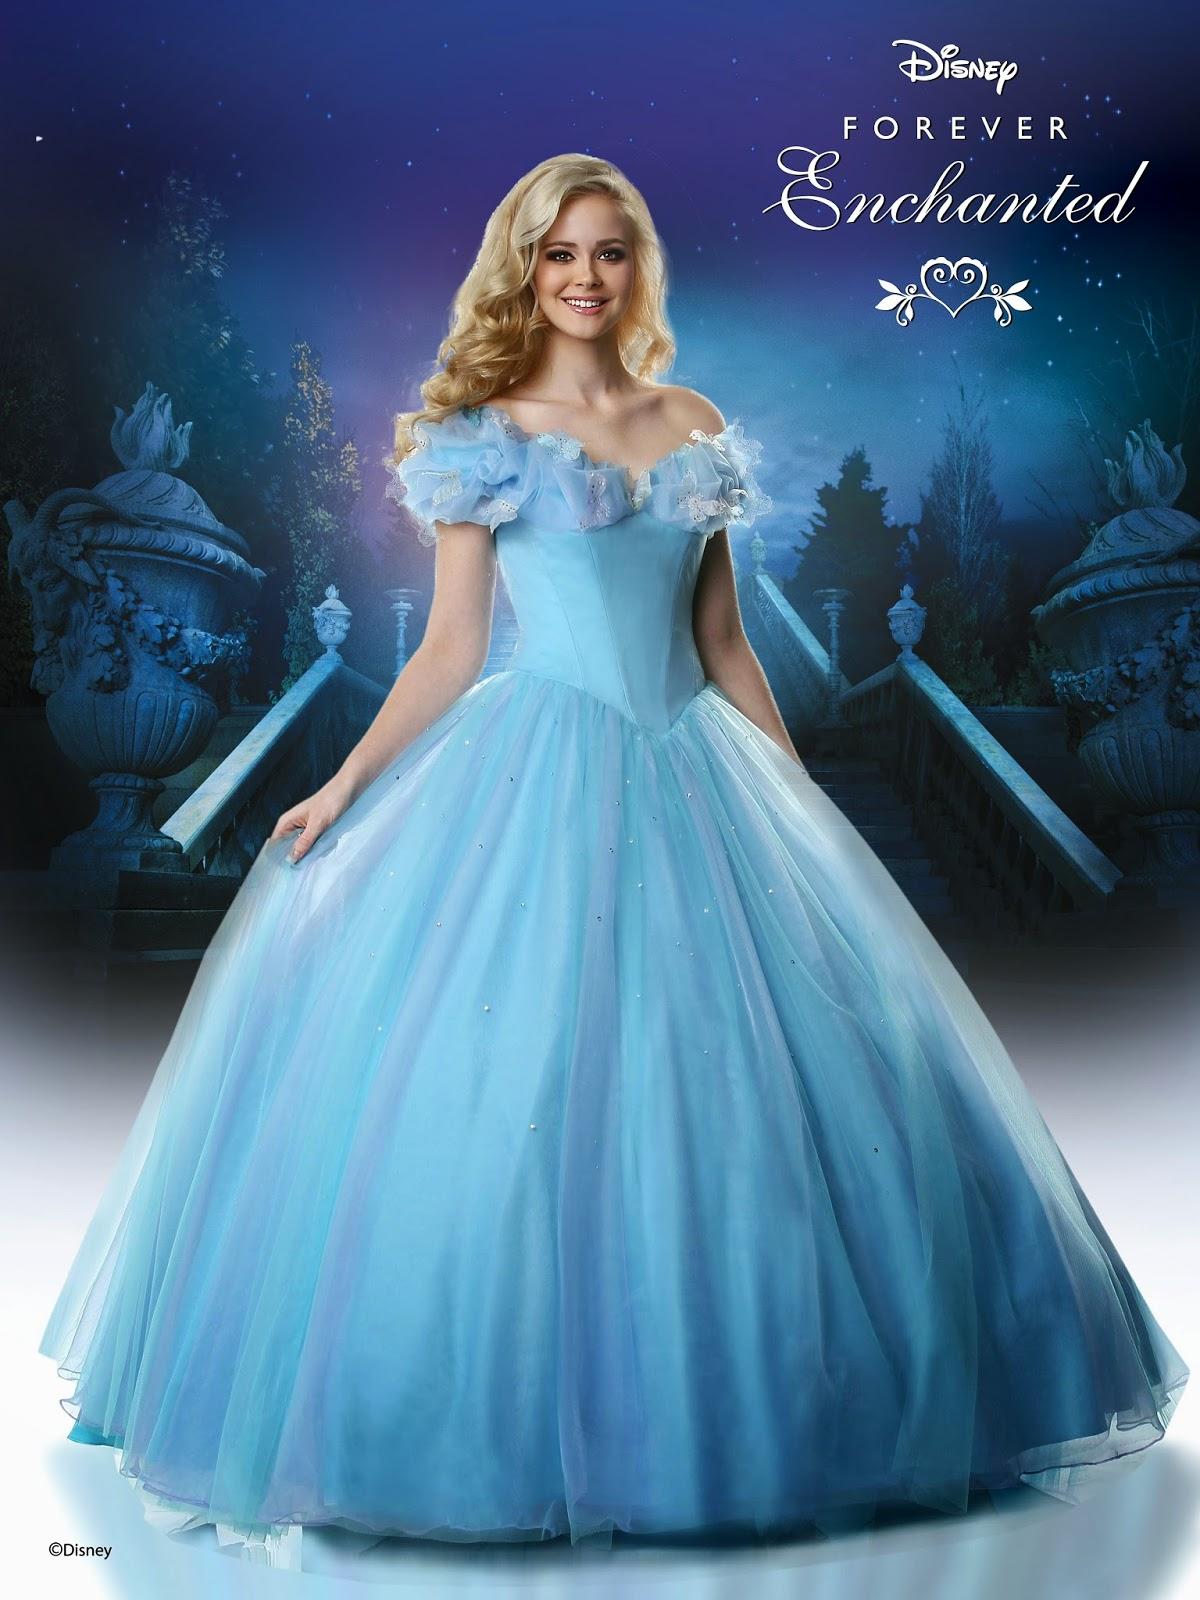 Disney Forever Enchanted Cinderella prom dress showcased during ...